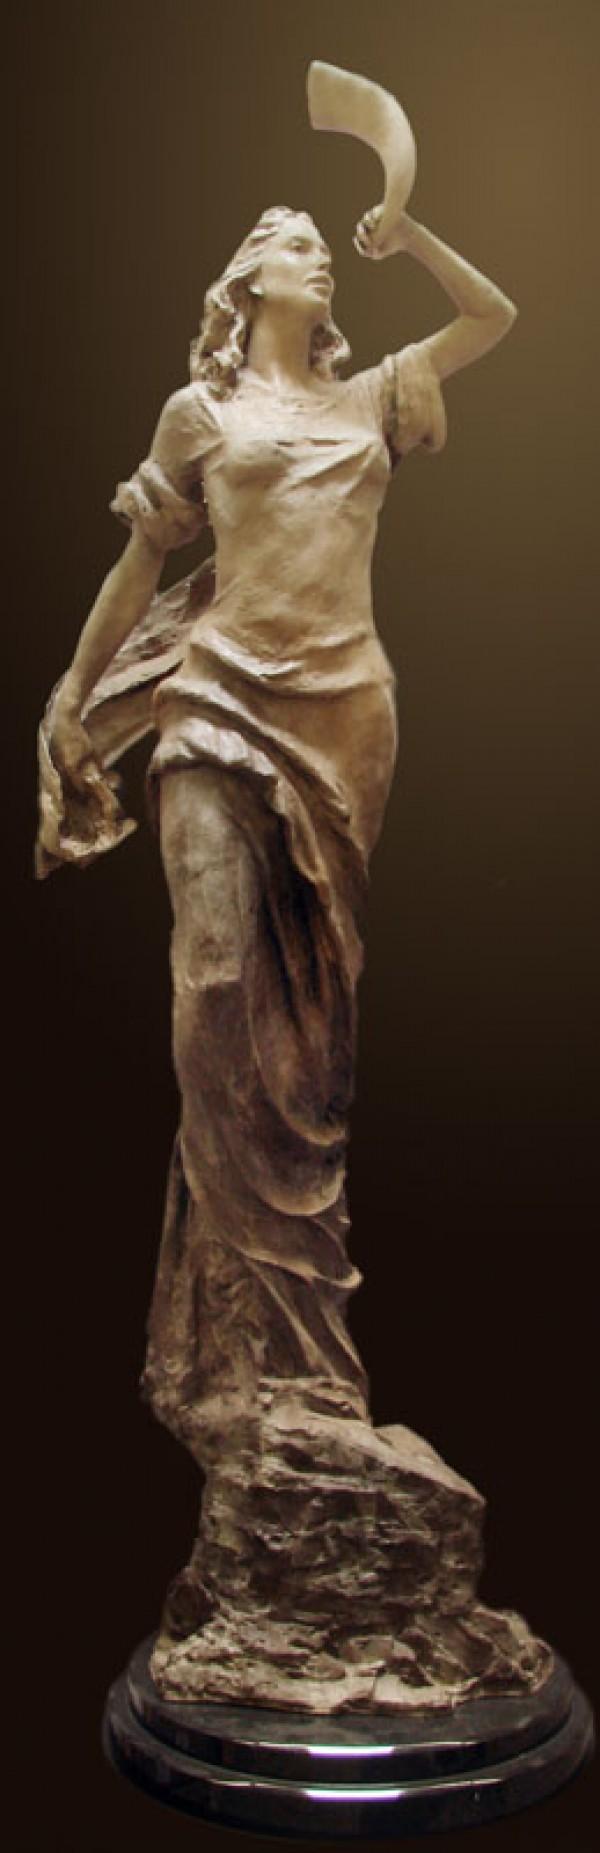 """Memory"" bronze sculpture by Tuan"